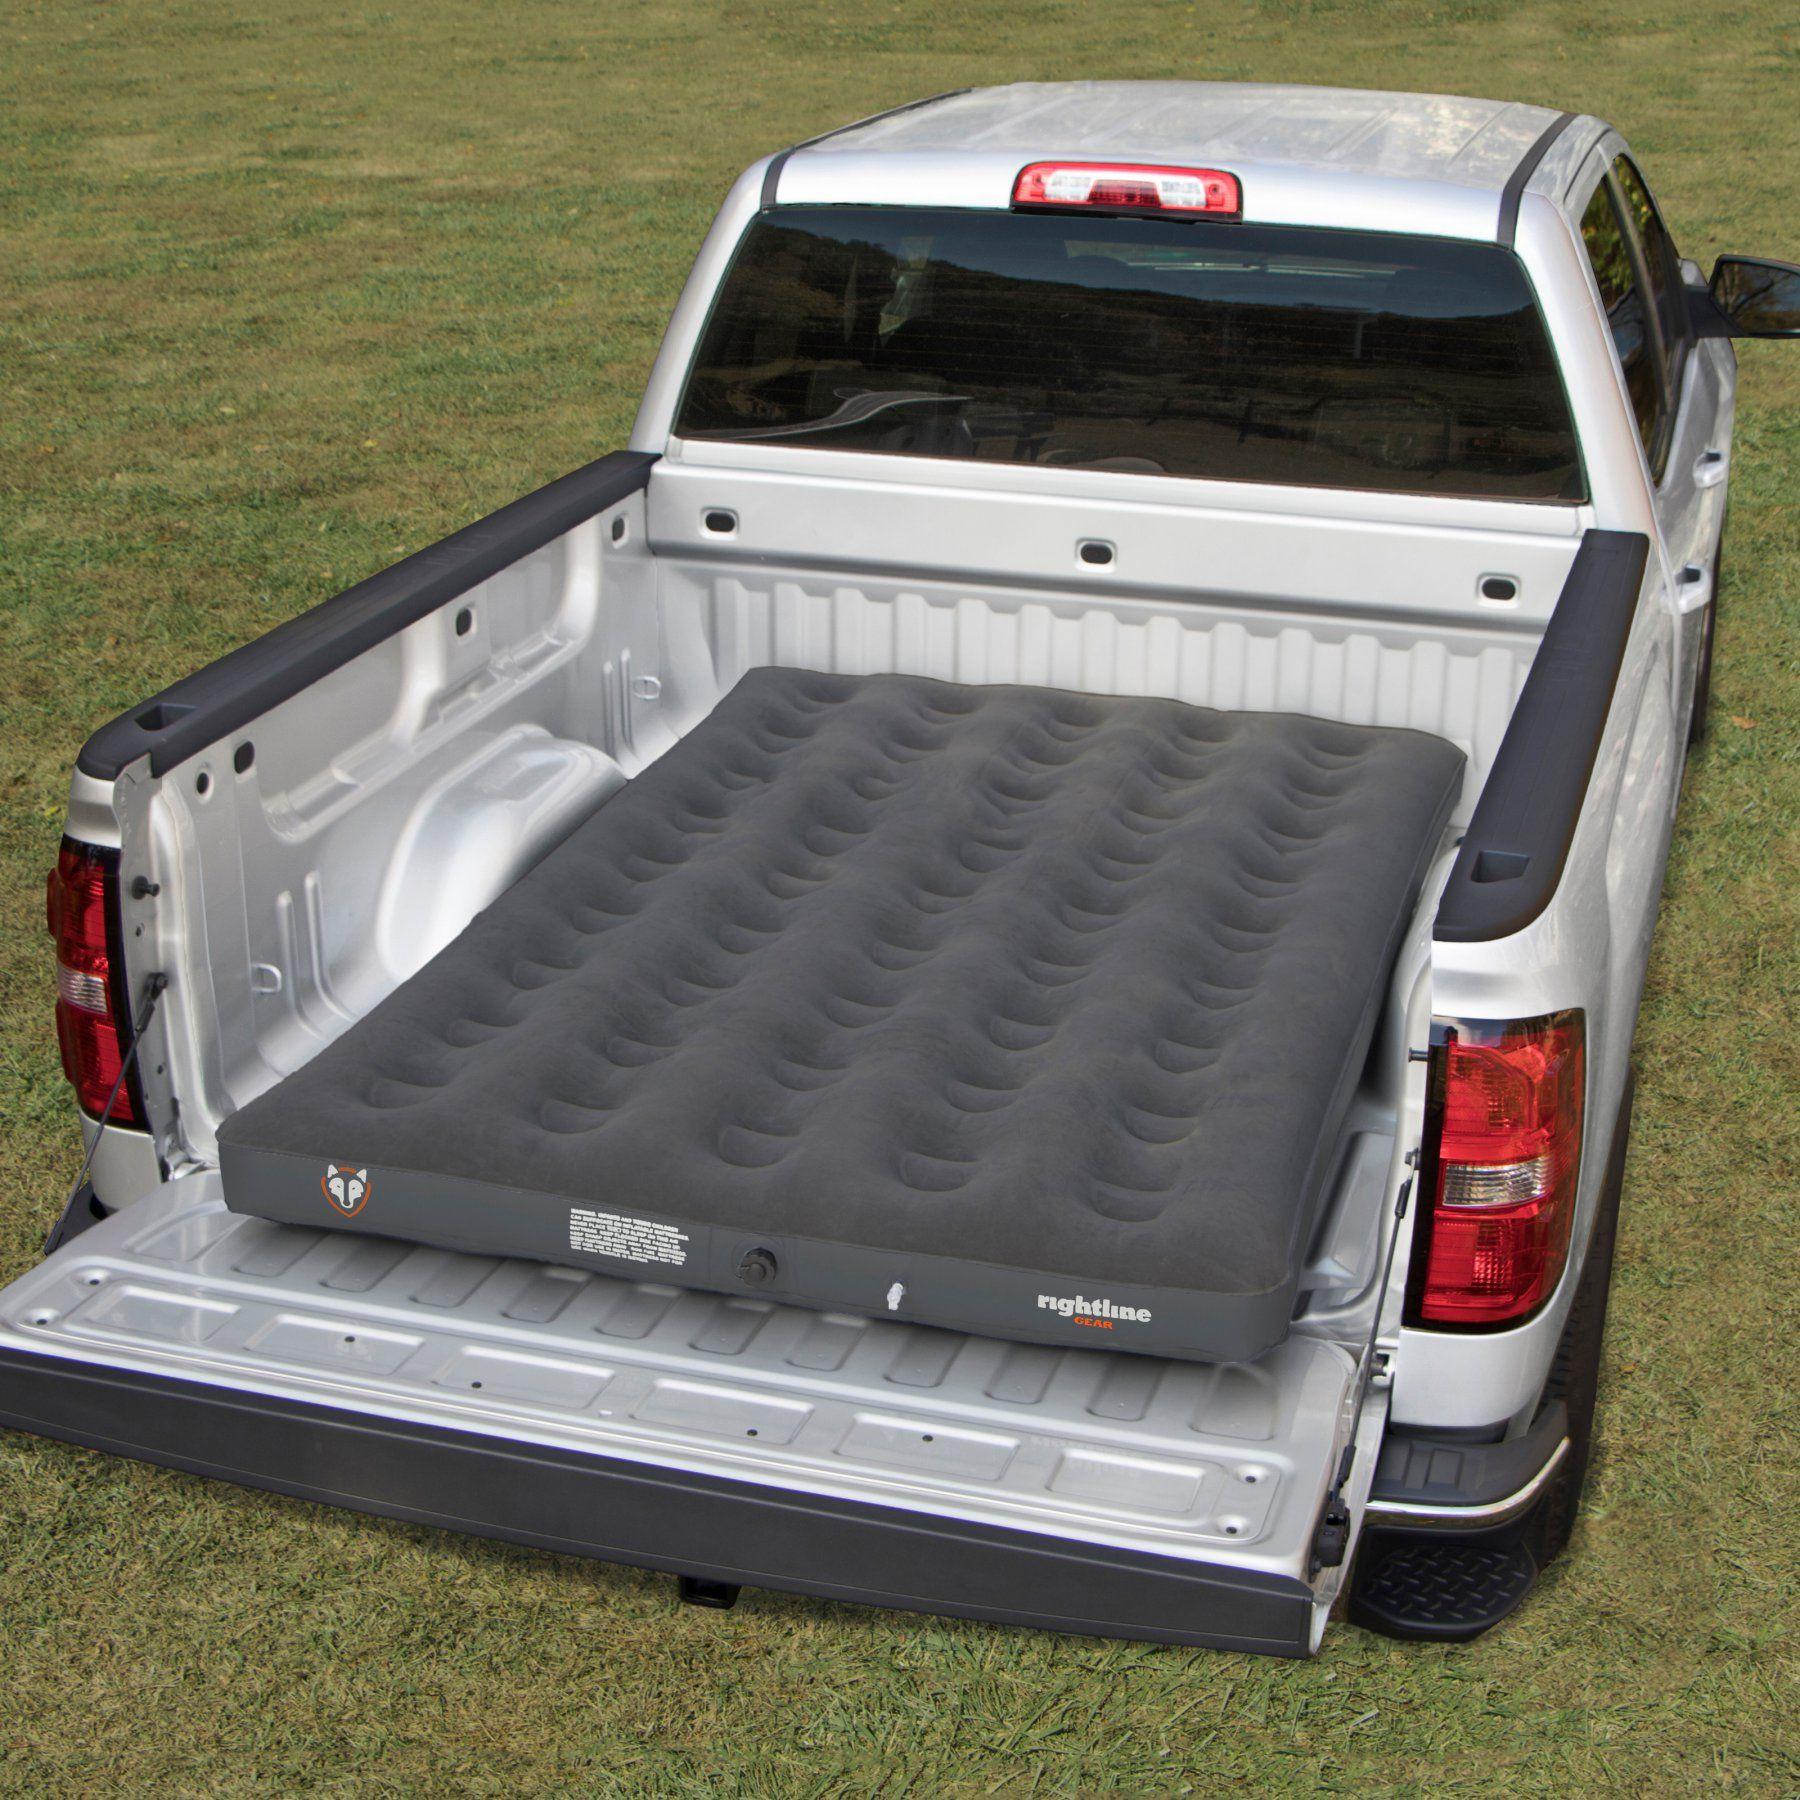 Rightline Gear Full Size Truck Bed Air Mattress 110M10